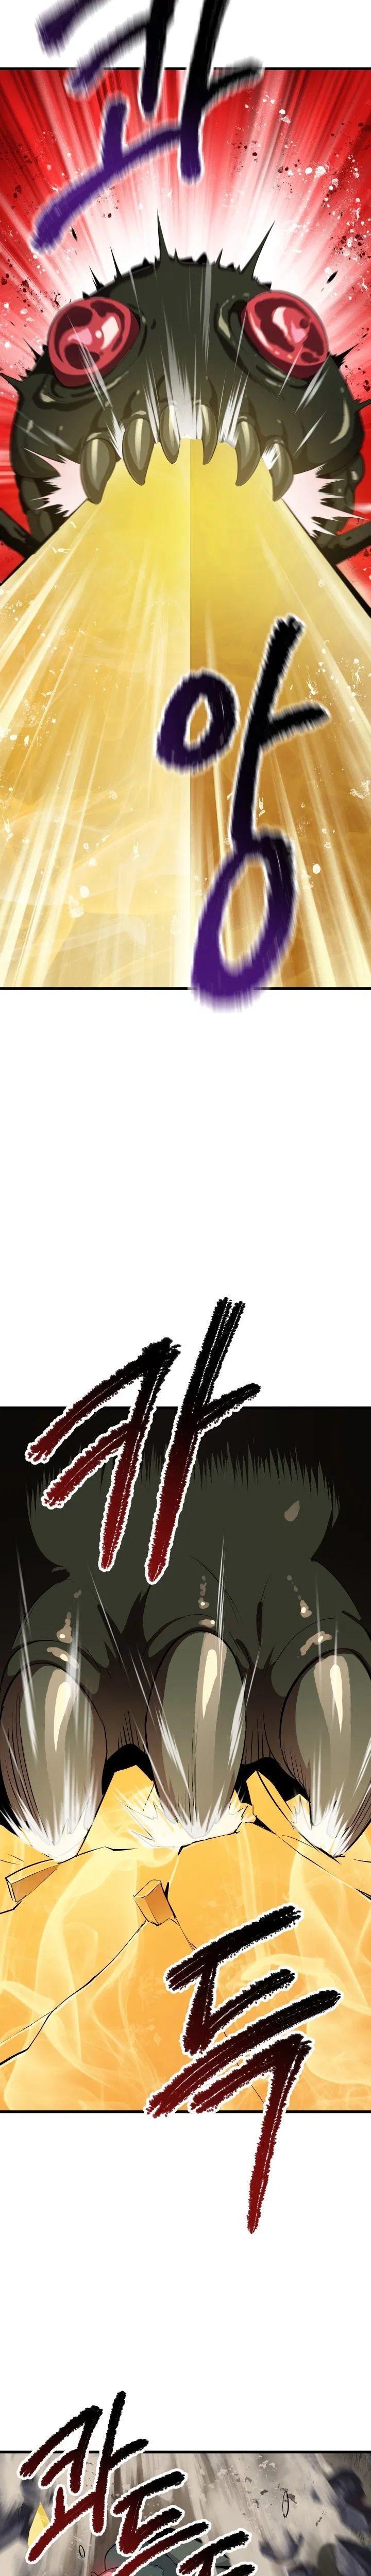 Survival Story Of A Sword King In A Fantasy World Chapter 59 page 8 - Mangakakalots.com